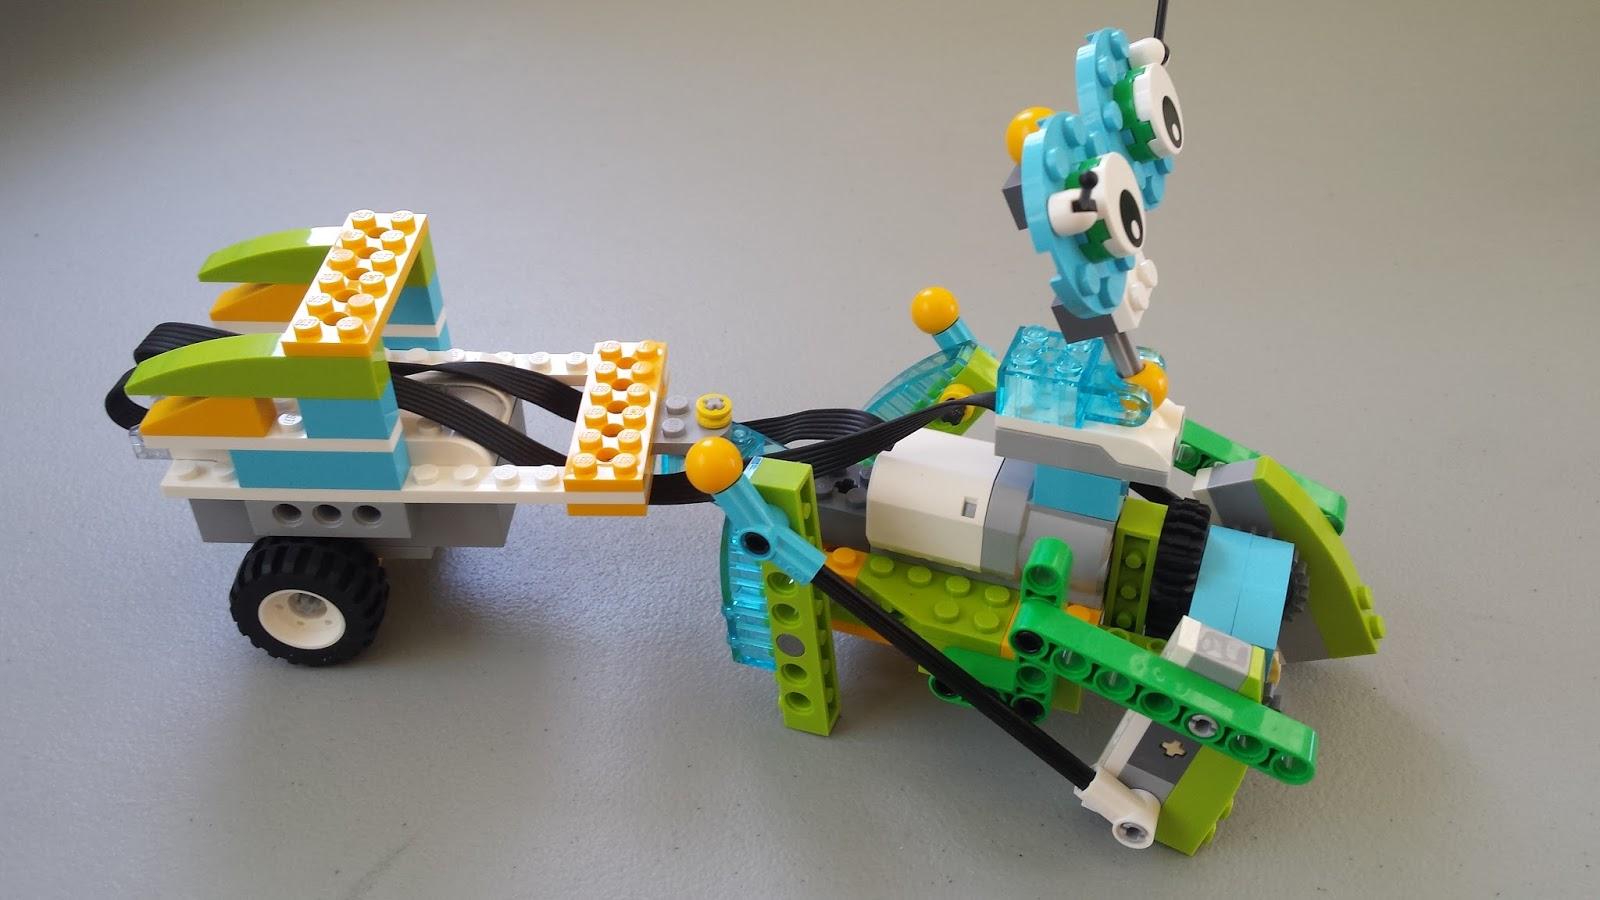 Aula Robótica Dominicana: Robótica con LEGO WEDO 2.0